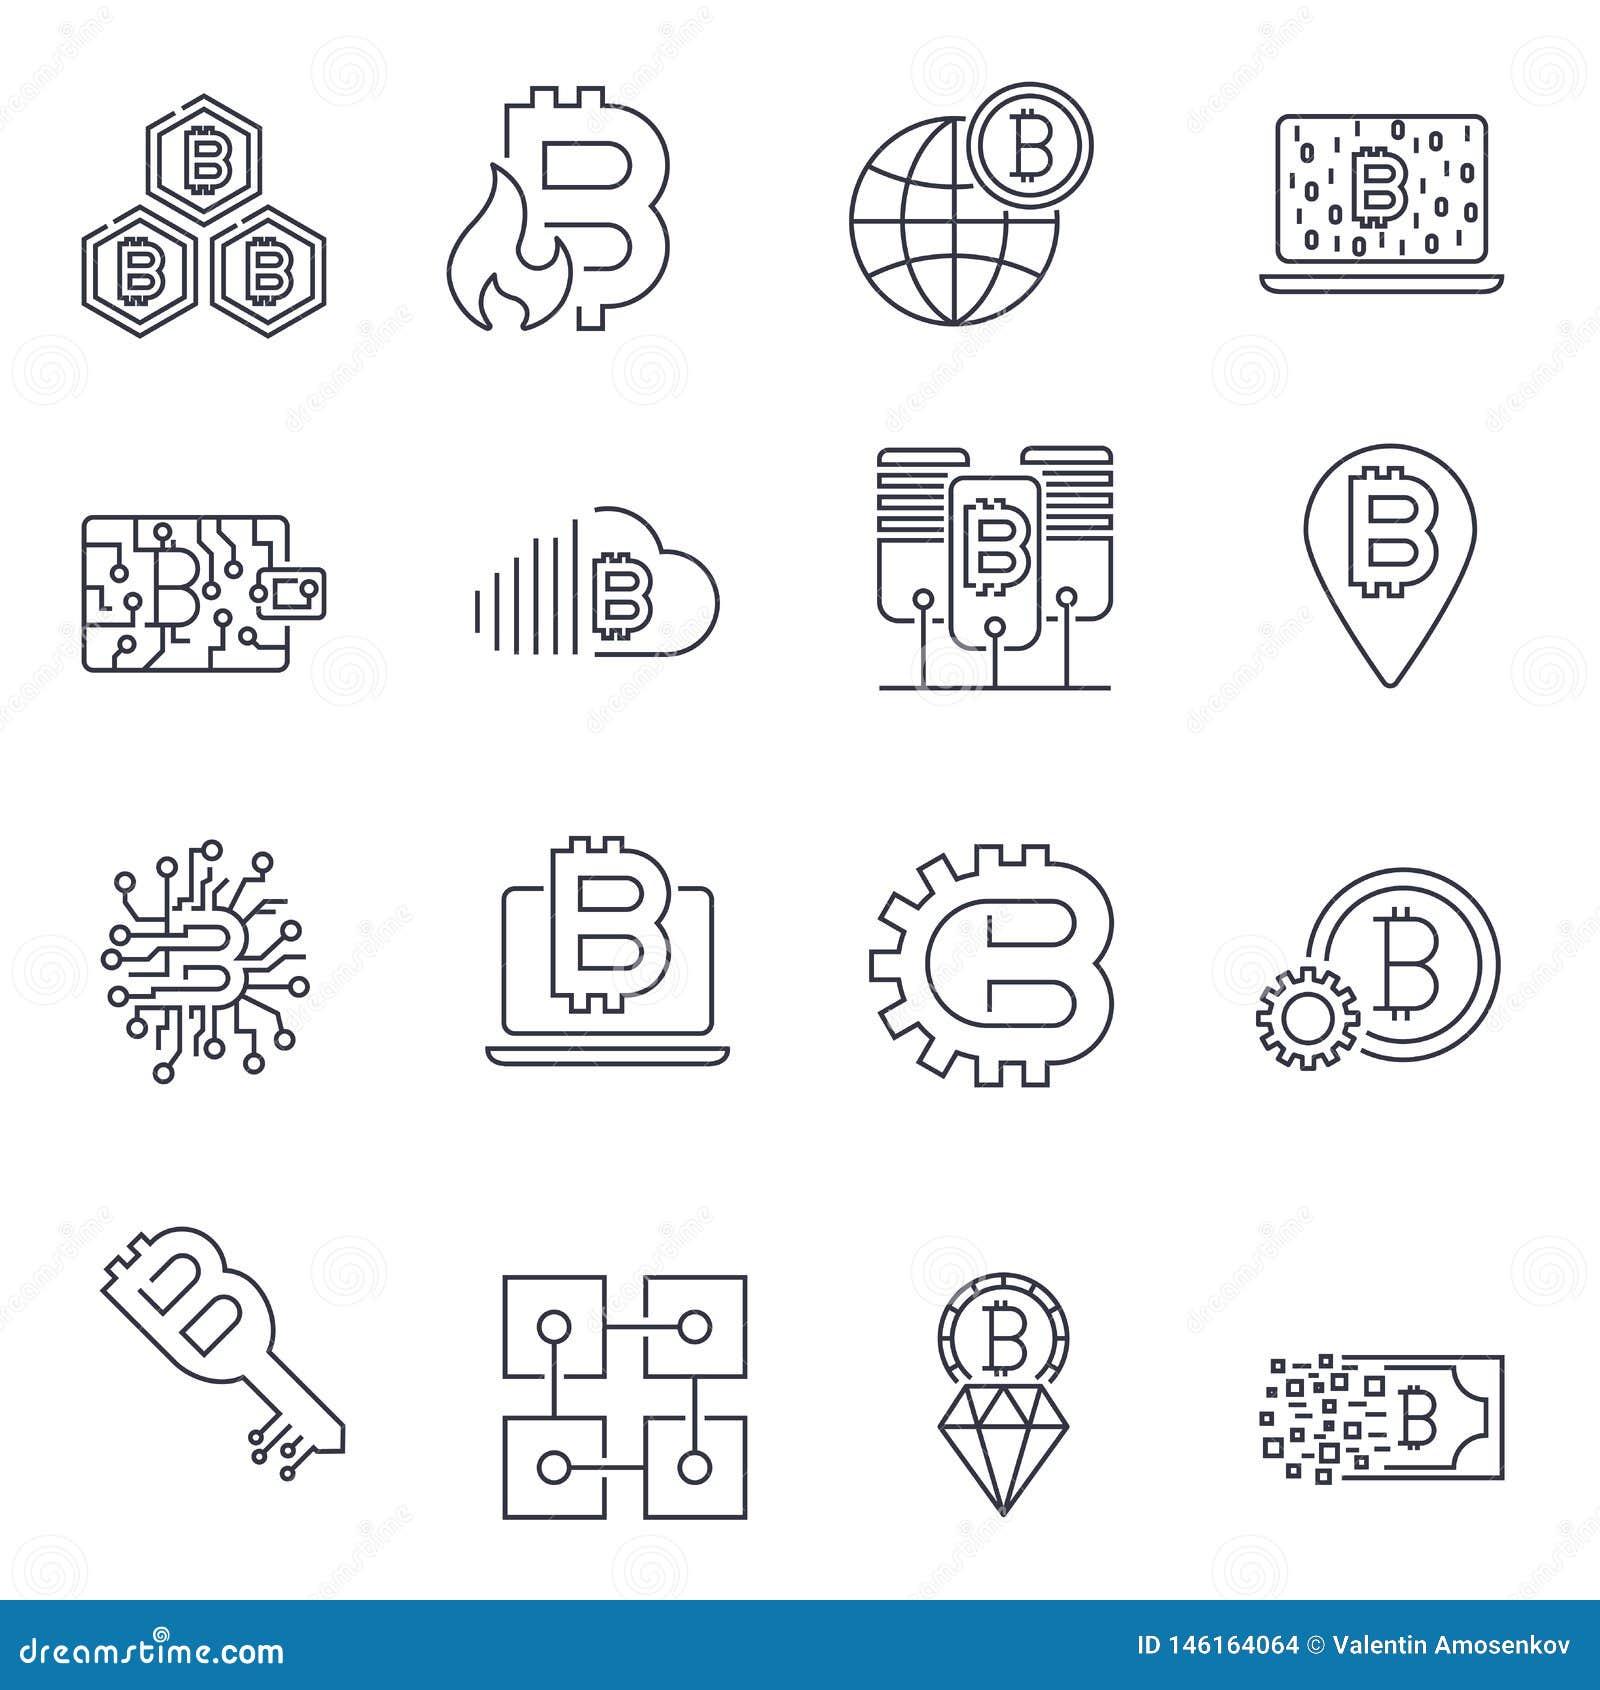 Blockchain, Bitcoin, εικονίδια Cryptocurrency καθορισμένα Bitcoin και blockchain τεχνολογία o